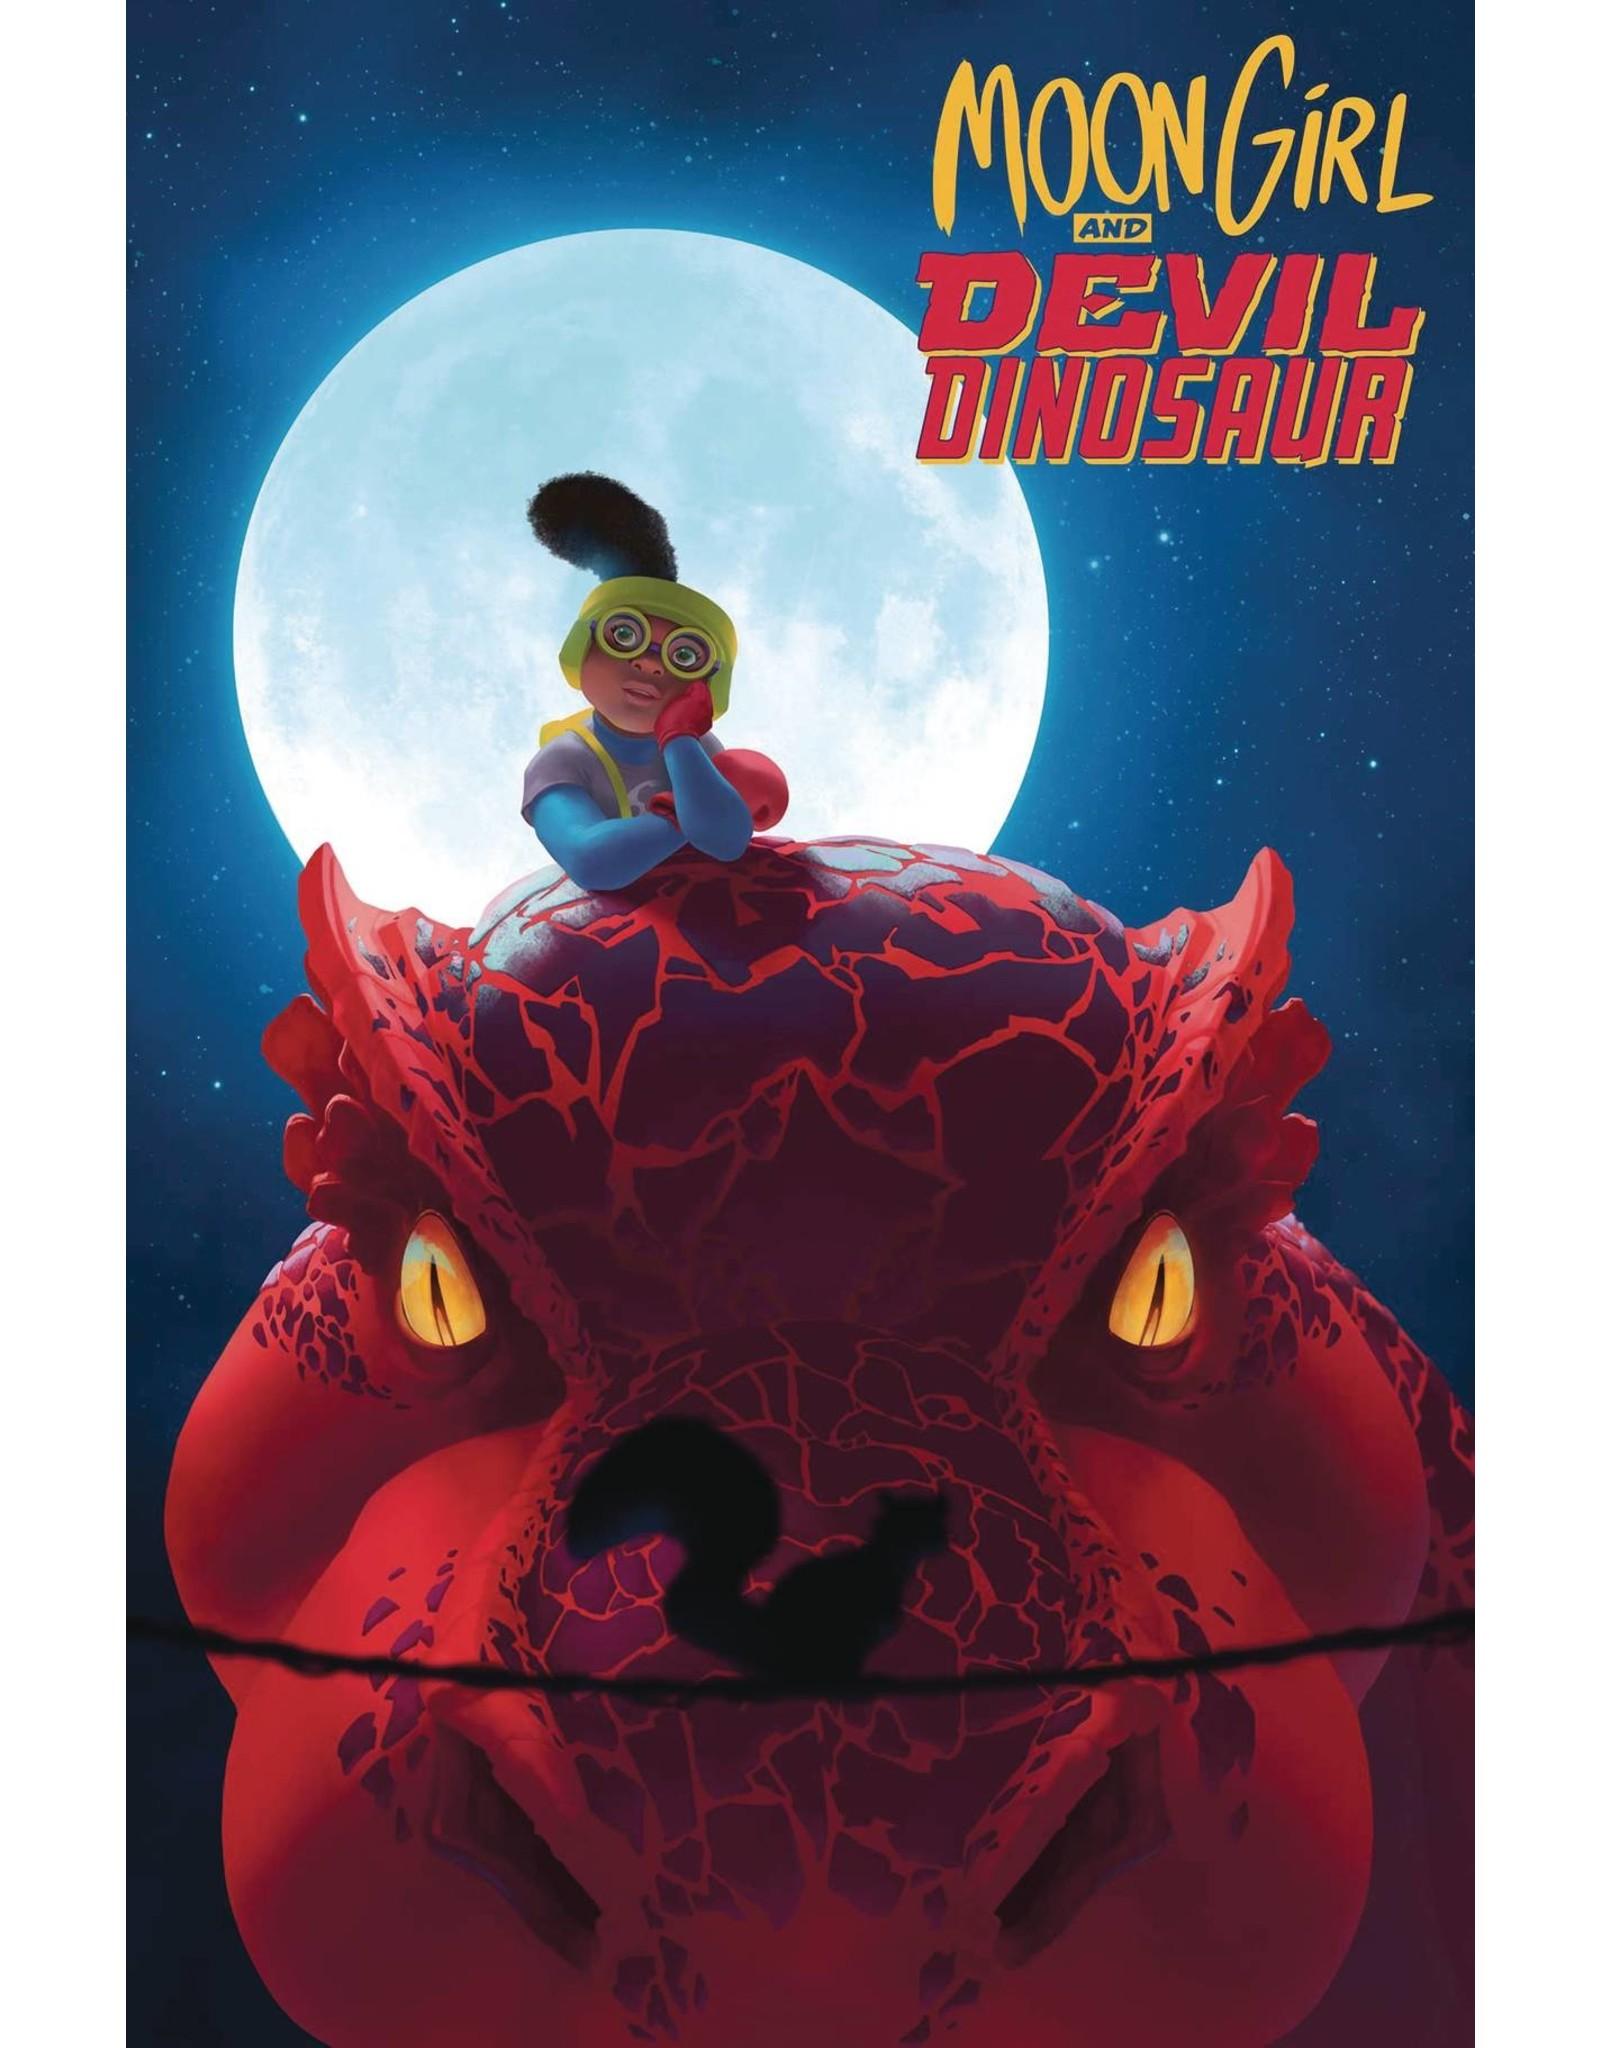 MARVEL COMICS MOON GIRL AND DEVIL DINOSAUR TP VOL 08 YANCY STREET LEGENDS